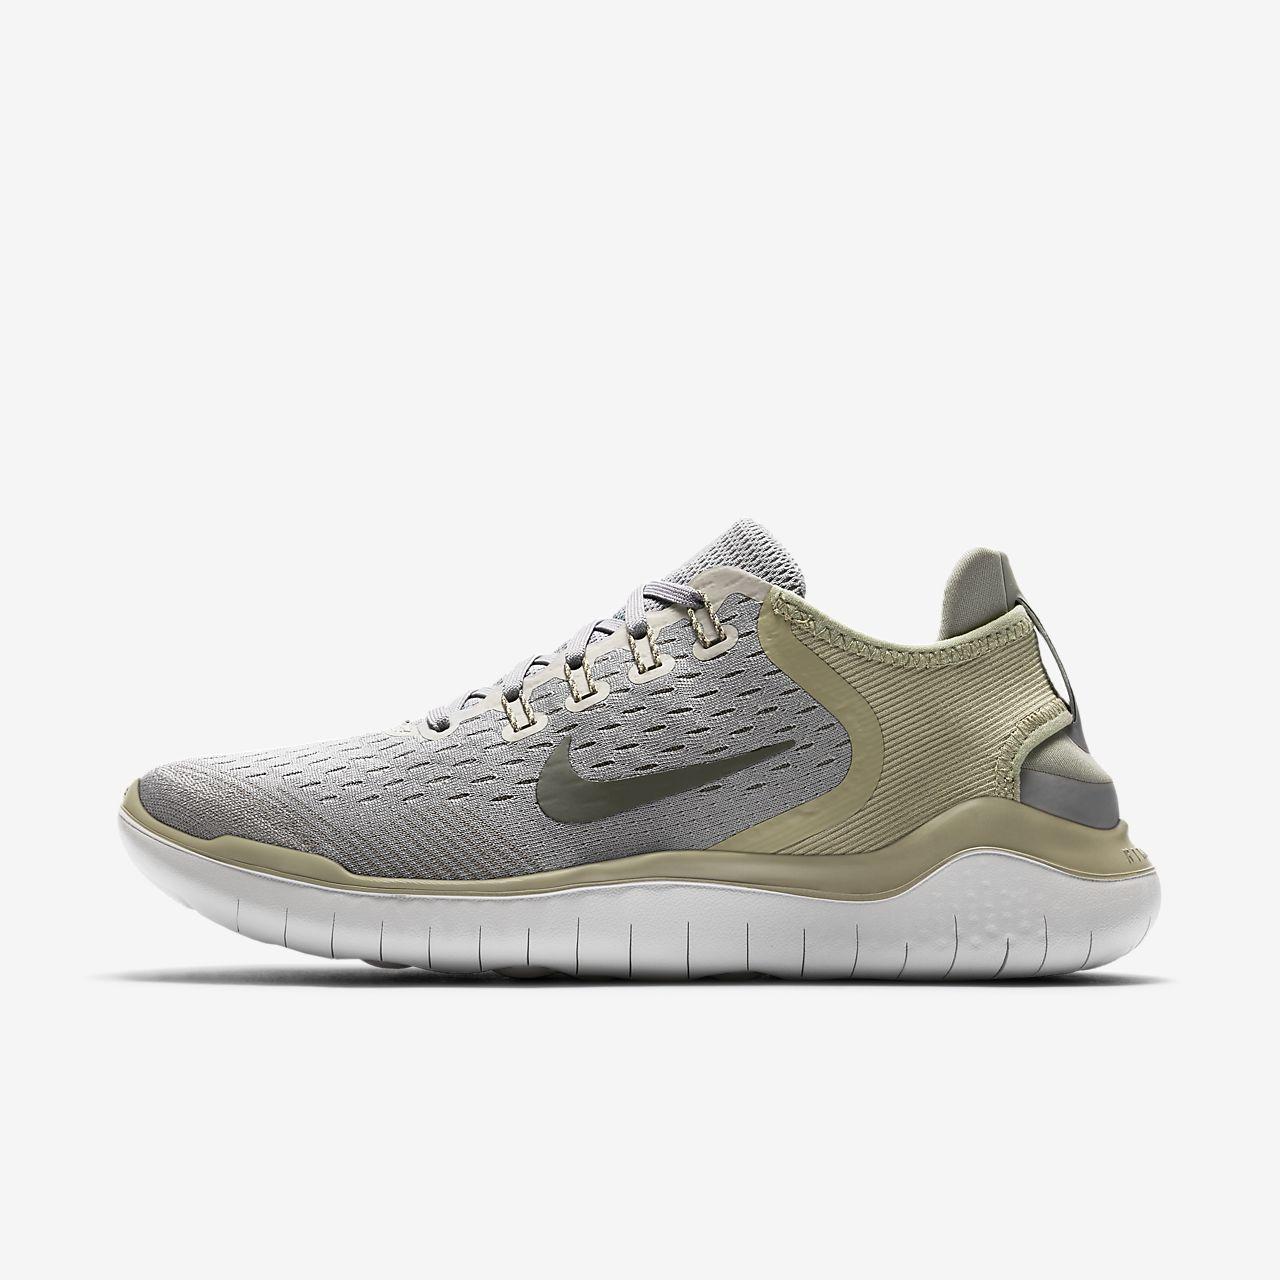 Nike FREE RN 2018 W Rose - Livraison Gratuite avec  - Chaussures Chaussures-de-running Femme